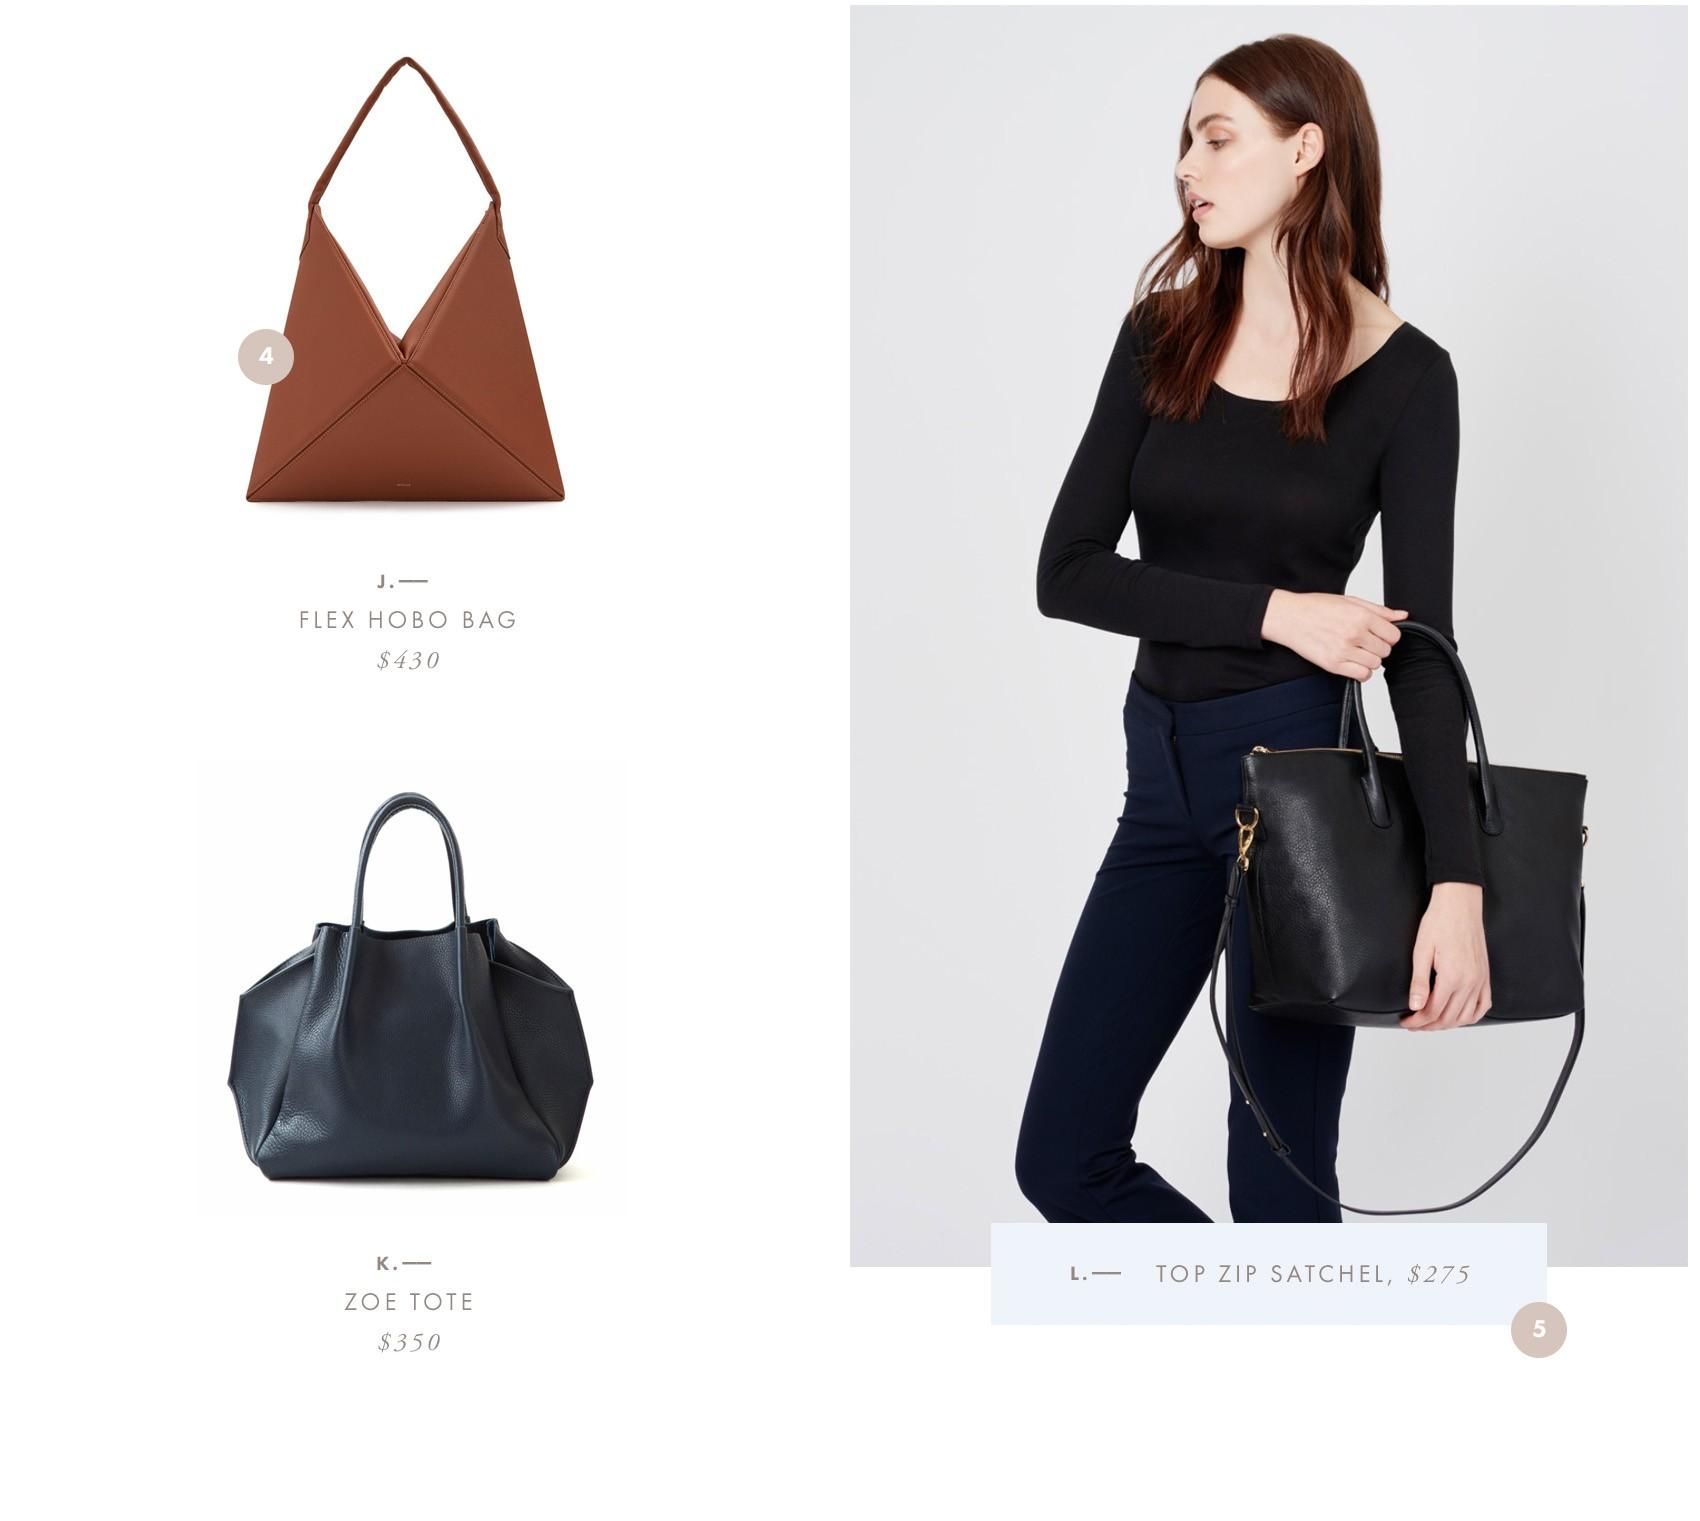 aa8a8672bab Ask V  The Everyday Handbag - Victoria McGinley Studio